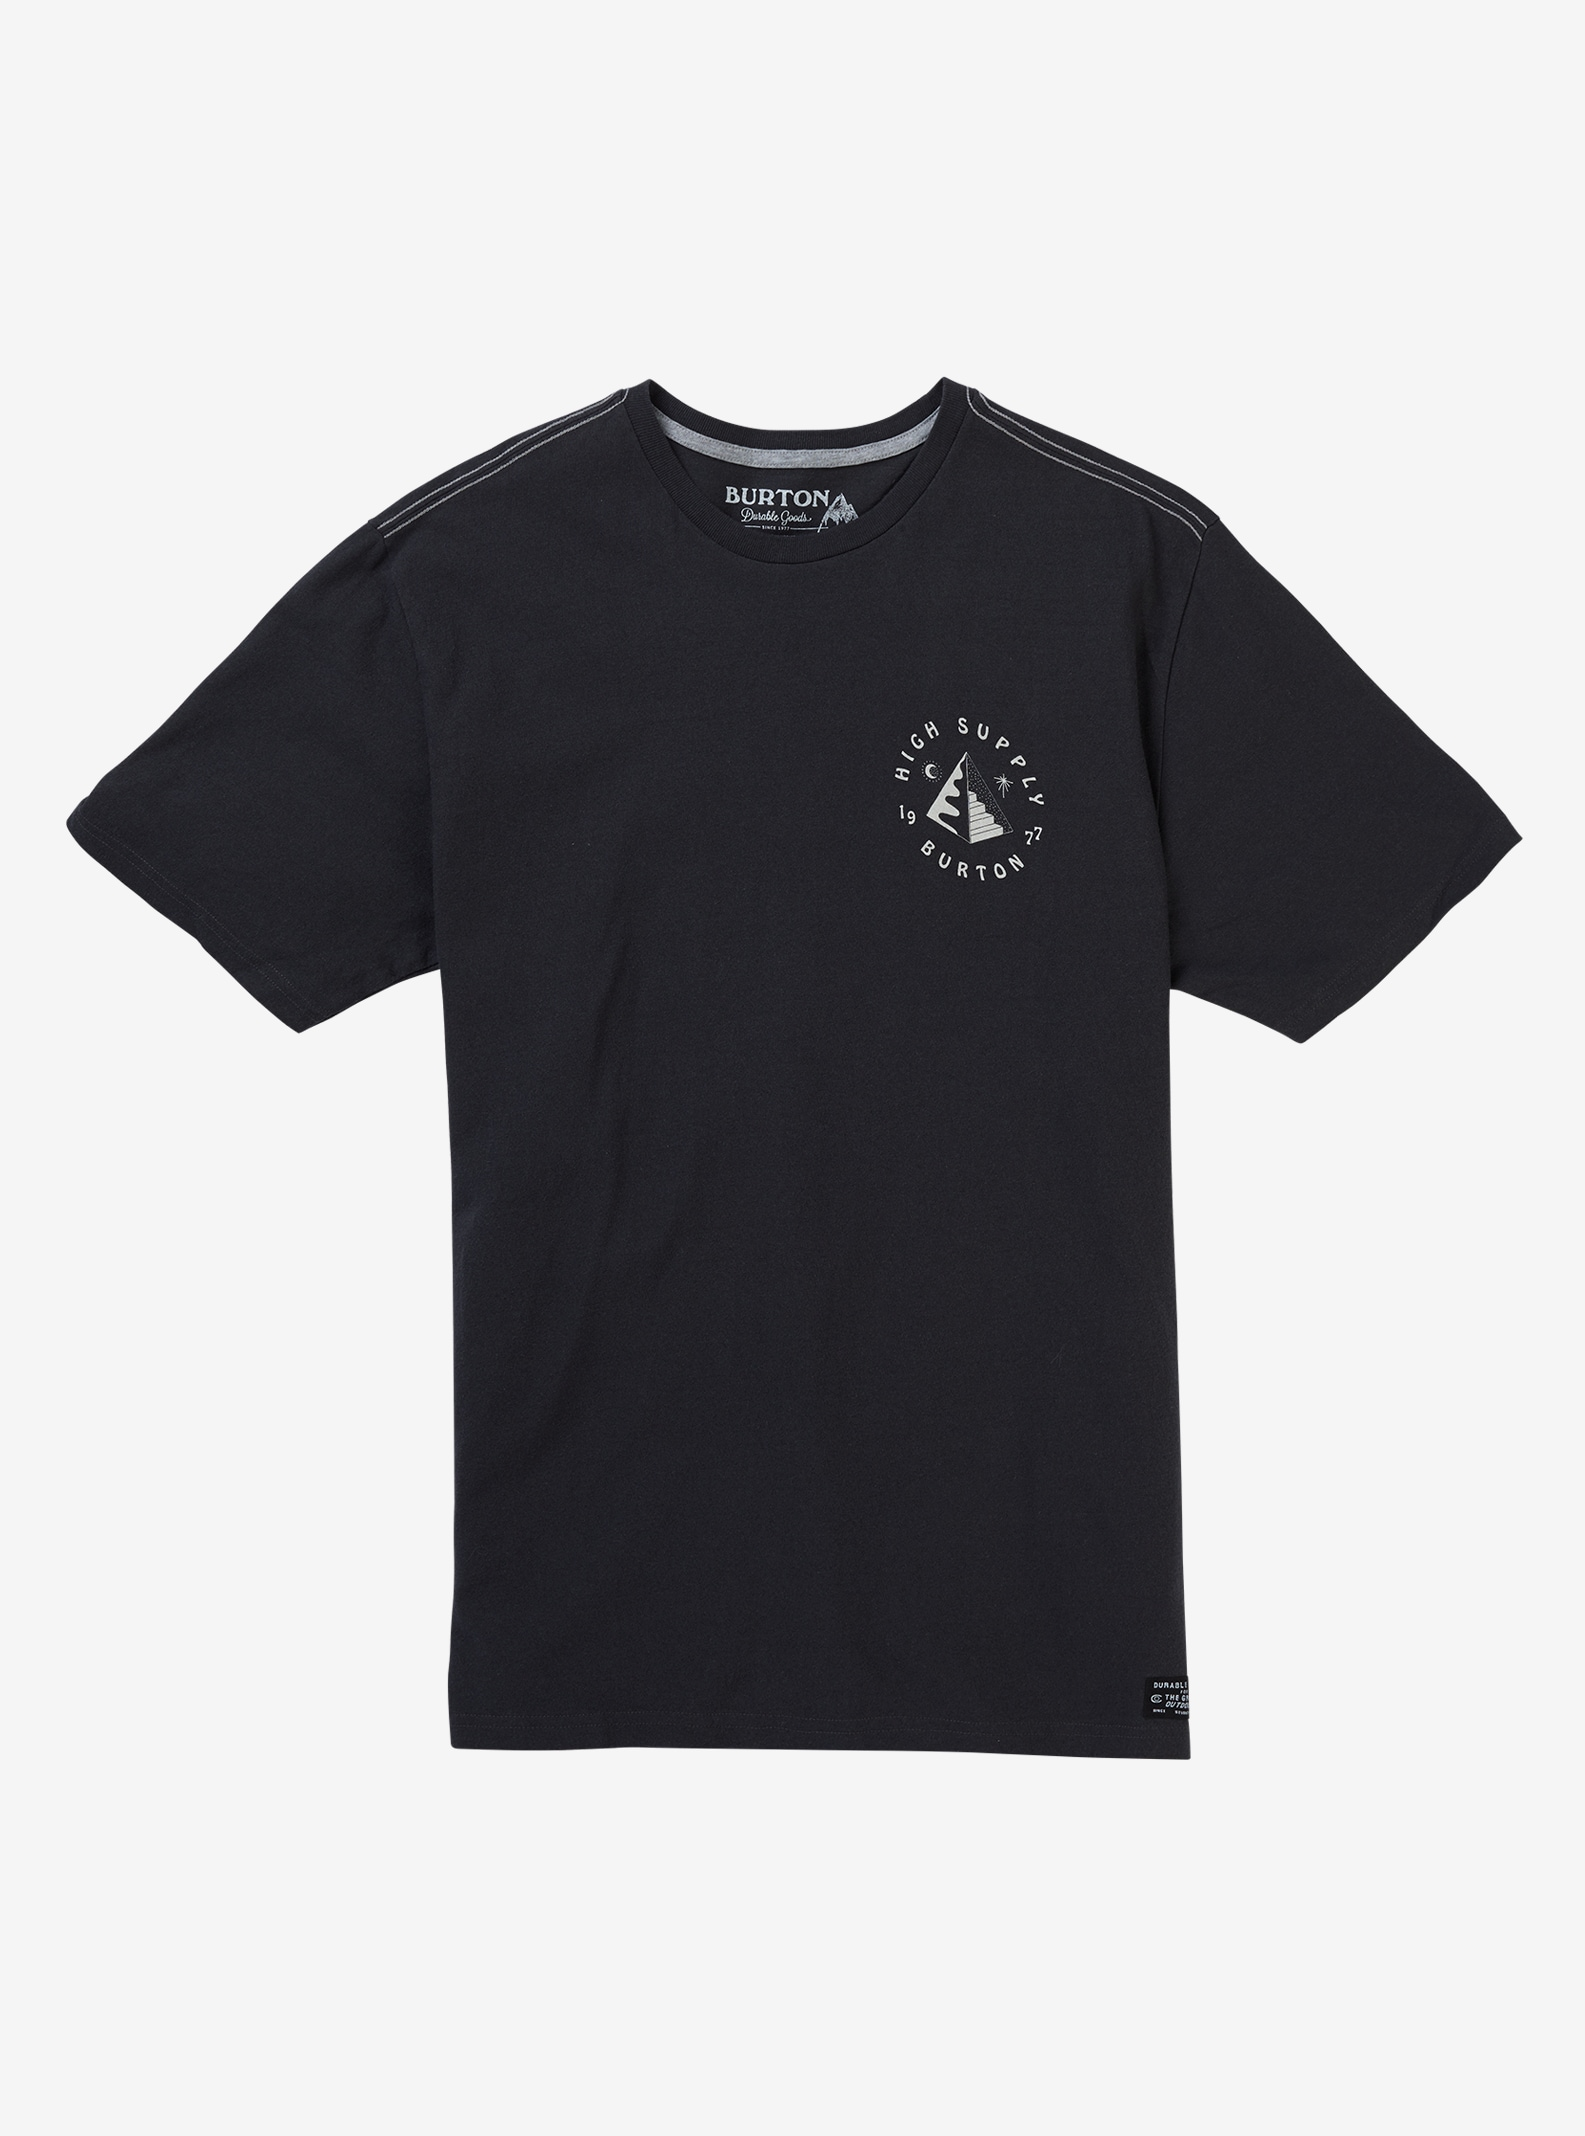 Men's Burton High Supply Short Sleeve T Shirt shown in Phantom